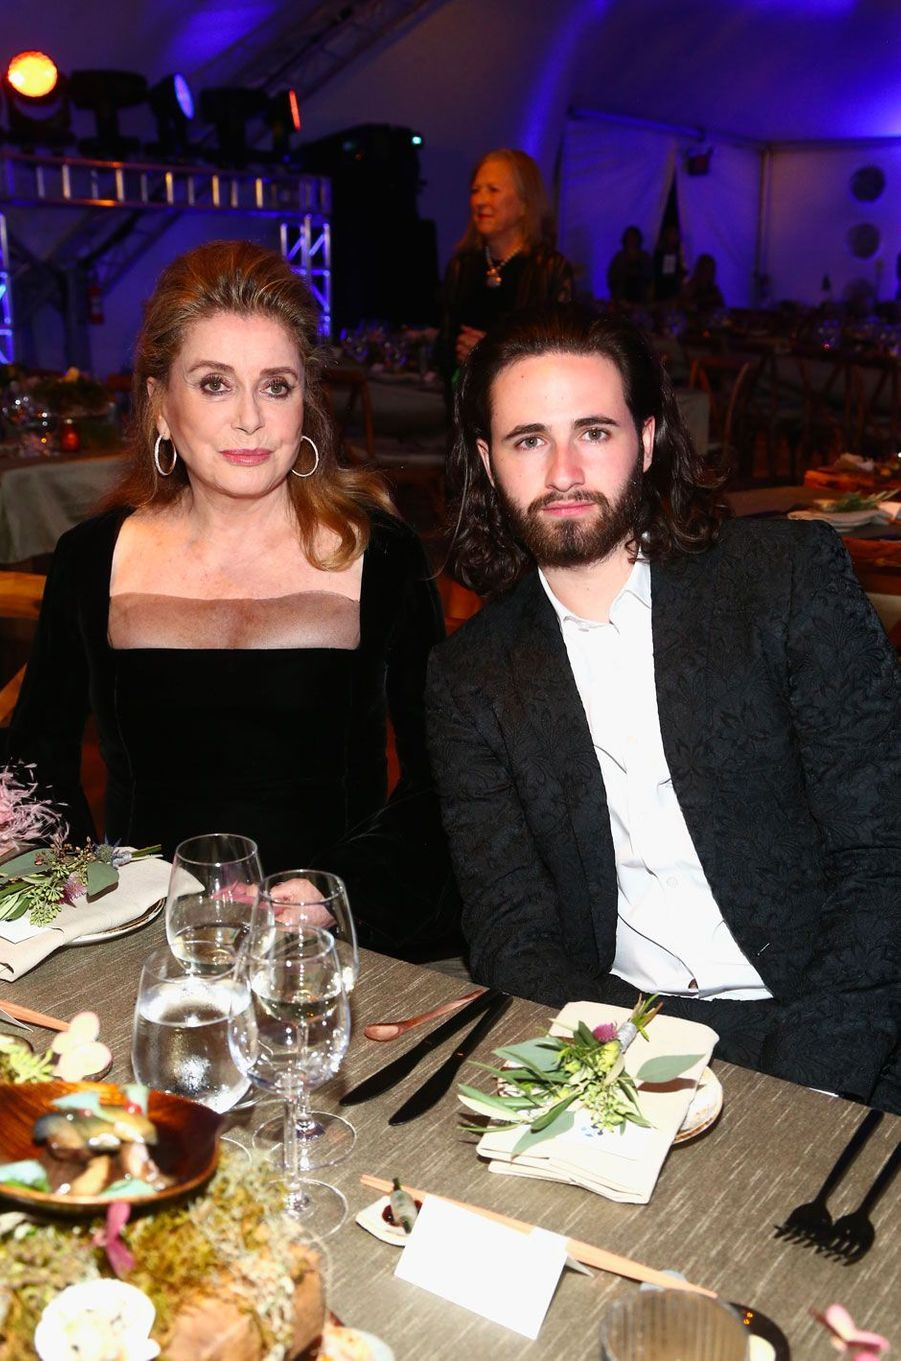 Catherine Deneuve et Christian Tye au gala de la Leonardo DiCaprio Foundadtion, le 15 septembre 2018 à Santa Rosa